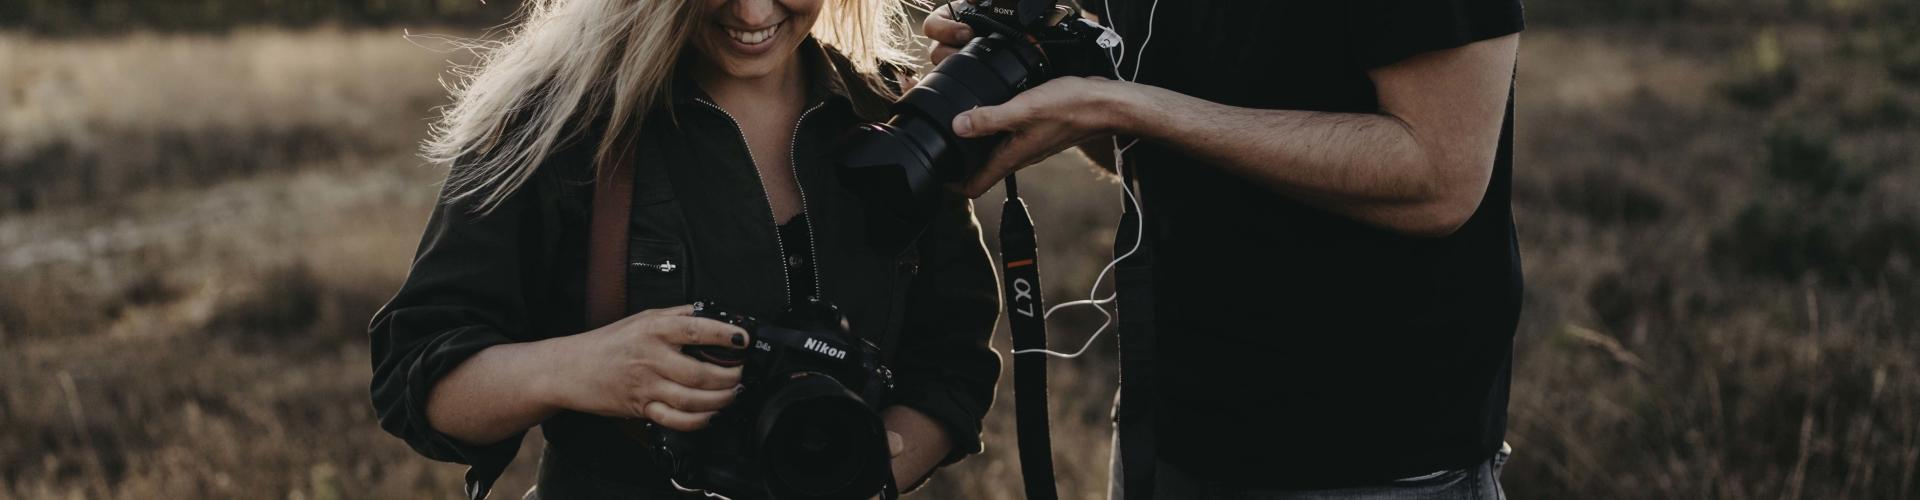 online-cursus-basisfotografie